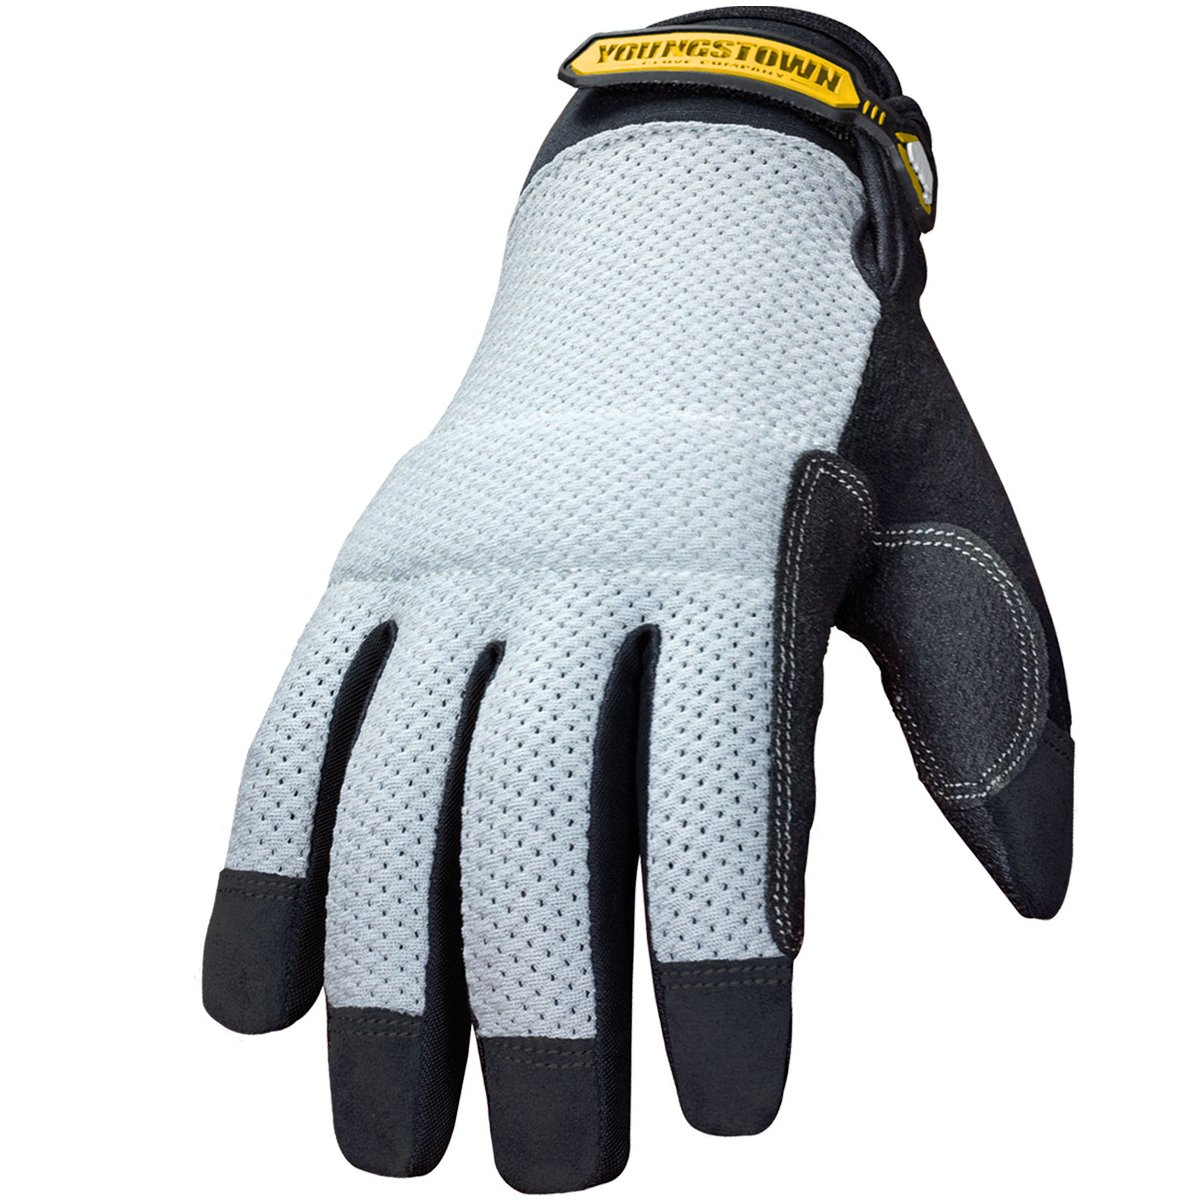 Caulfield E26017 General Utility Plus Mesh Work Glove, XX-large 04-3070-70-XXL